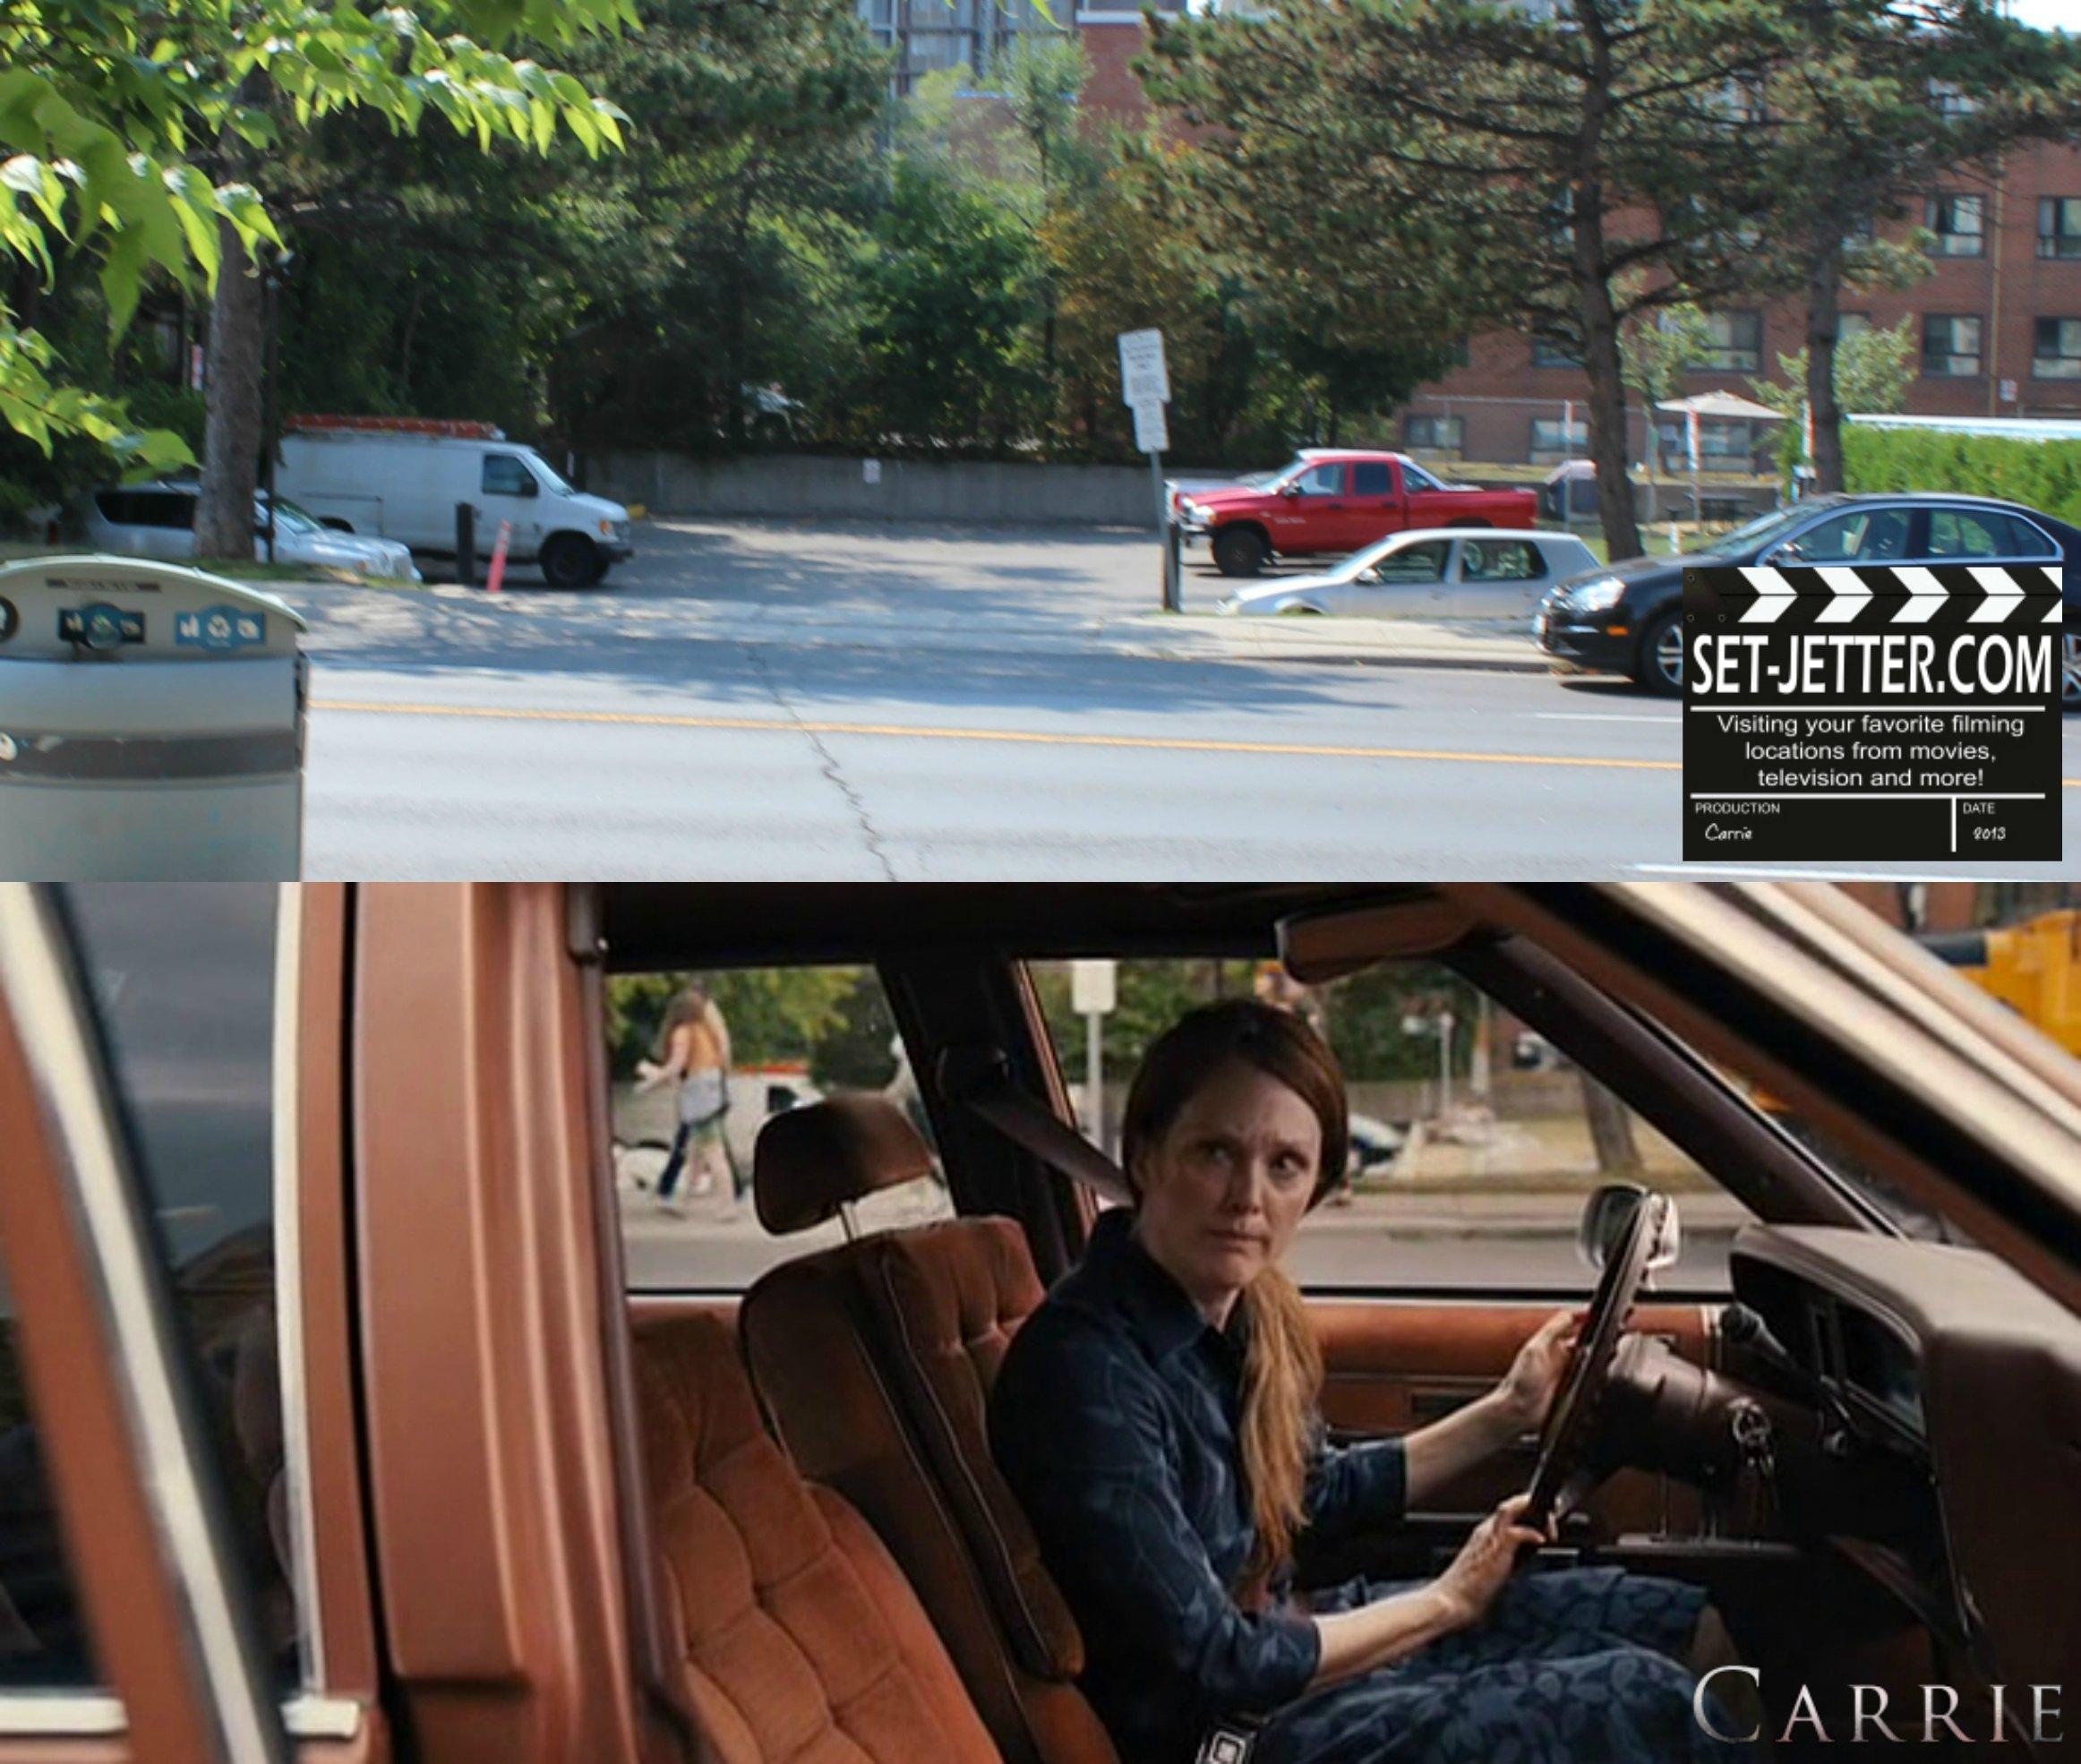 Carrie 2013 comparison 100.jpg